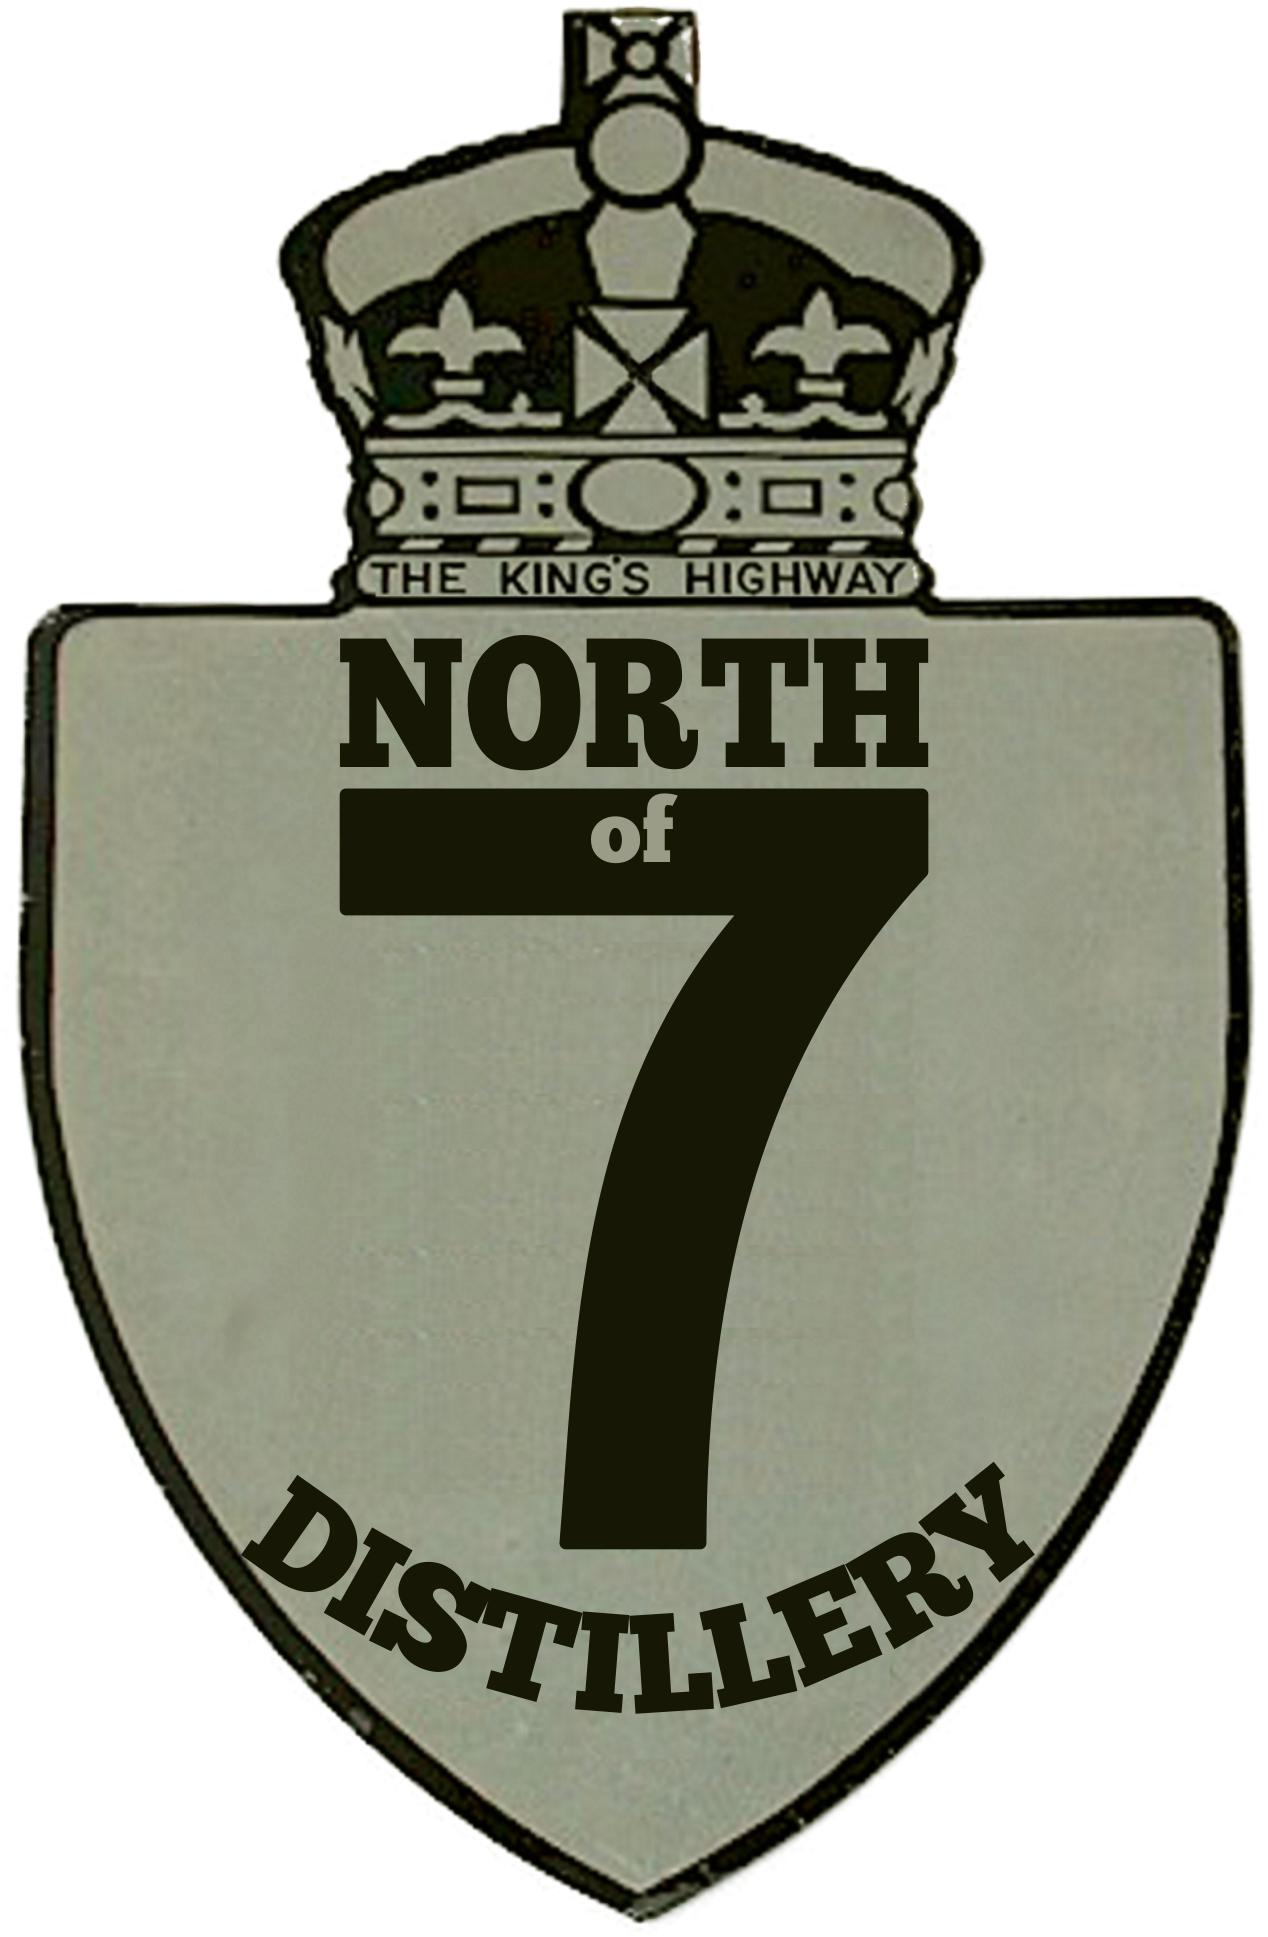 North of 7 Distillery